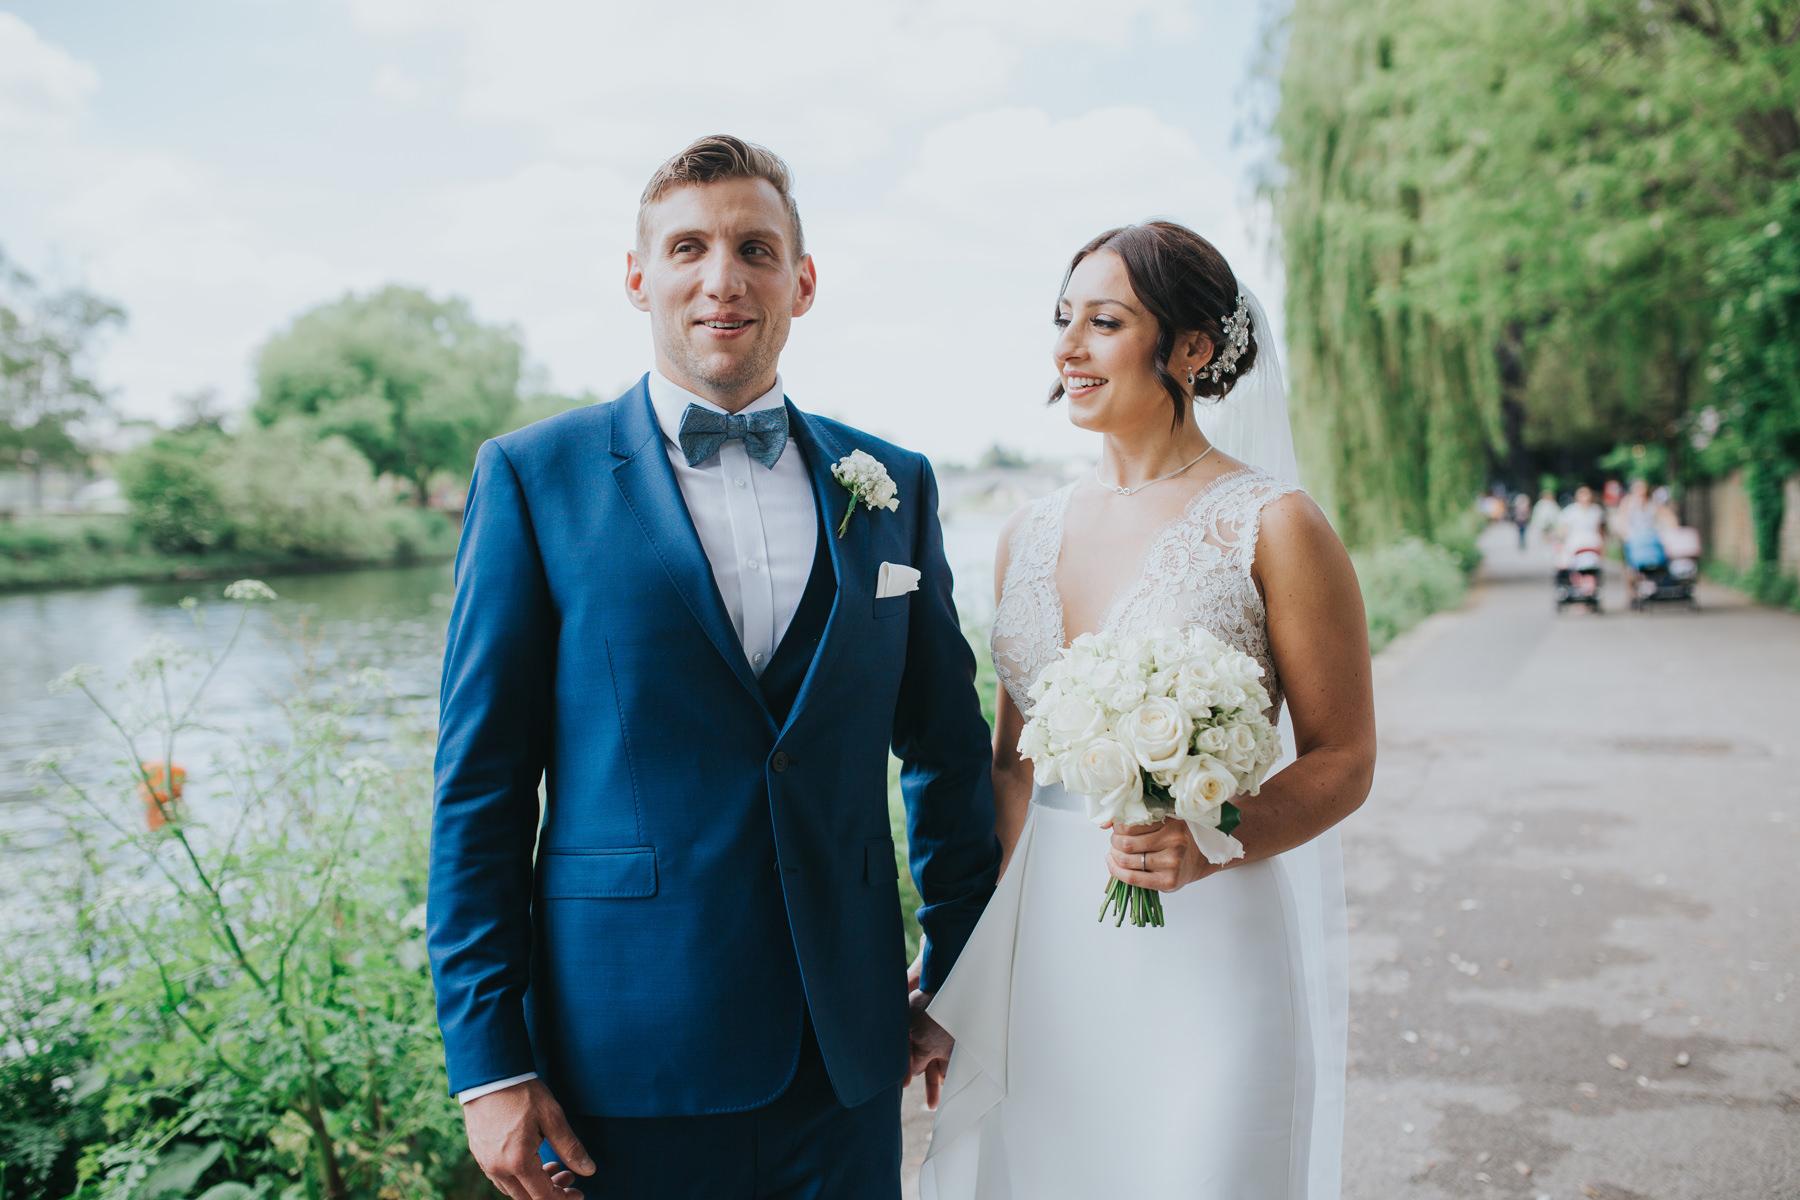 CRL-379-The Bingham wedding Richmond-Claire Rob bridal couple portraits on Thamespath.jpg